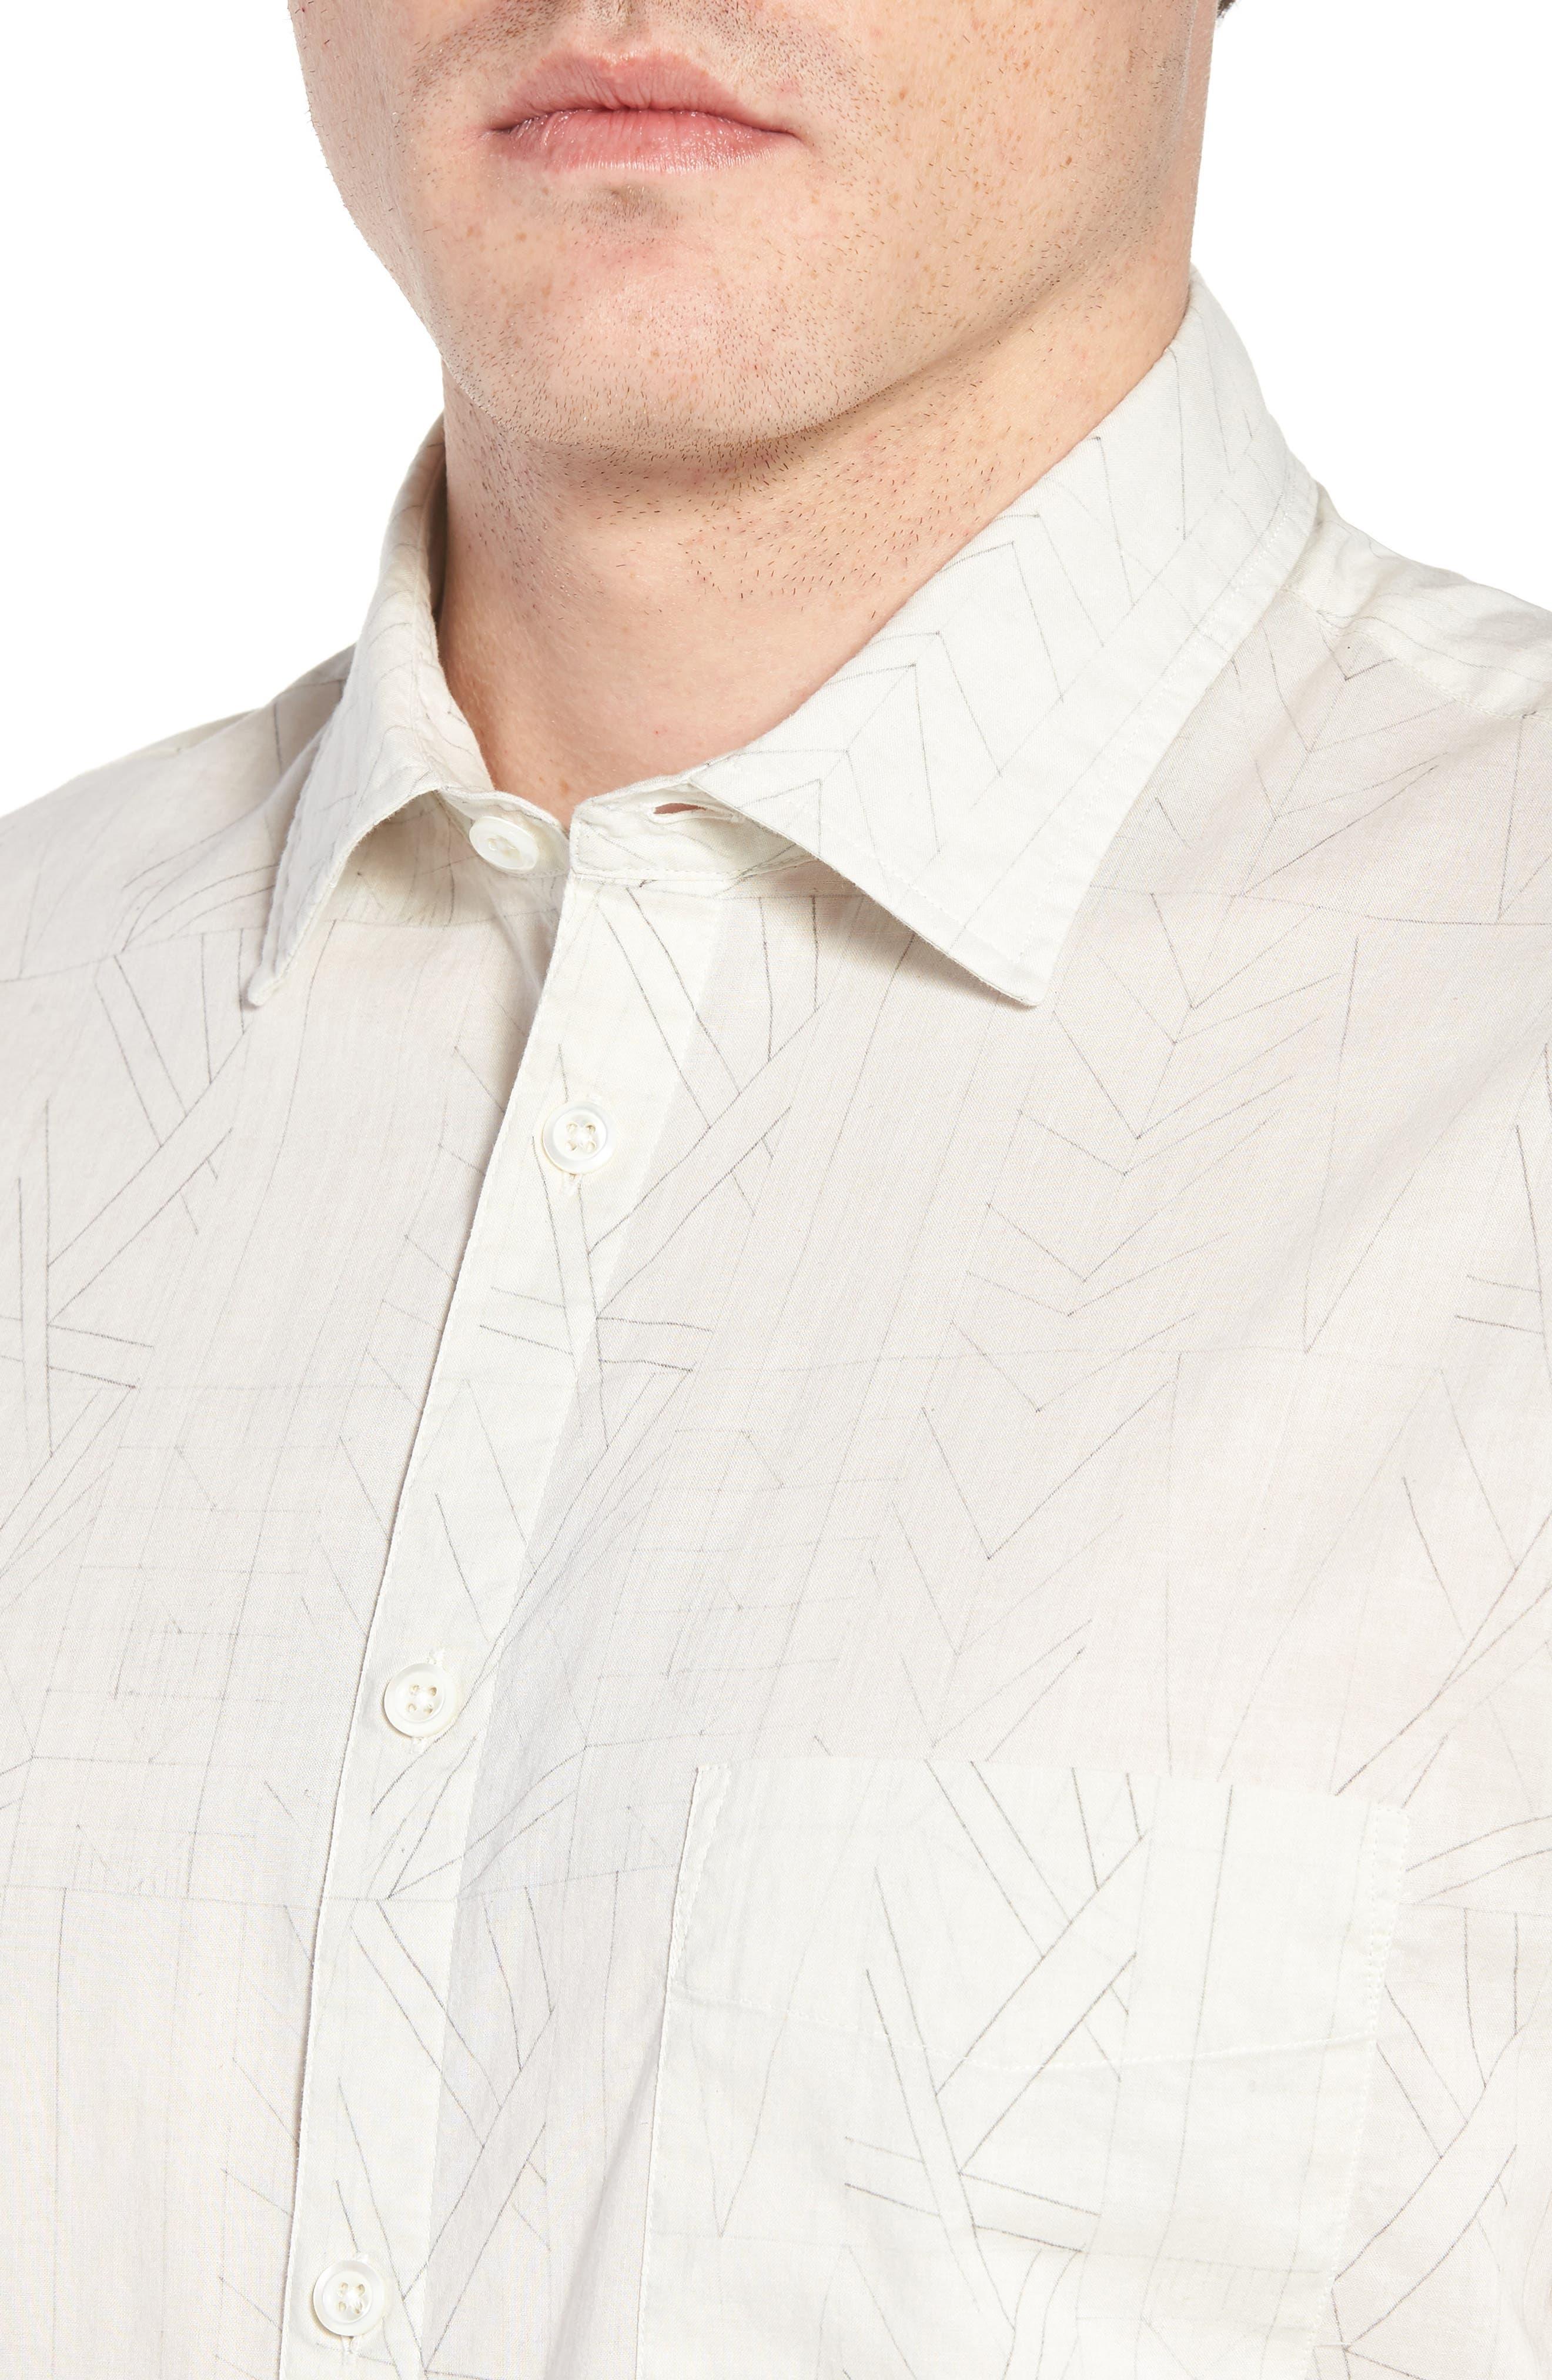 John Sport Shirt,                             Alternate thumbnail 4, color,                             Natural